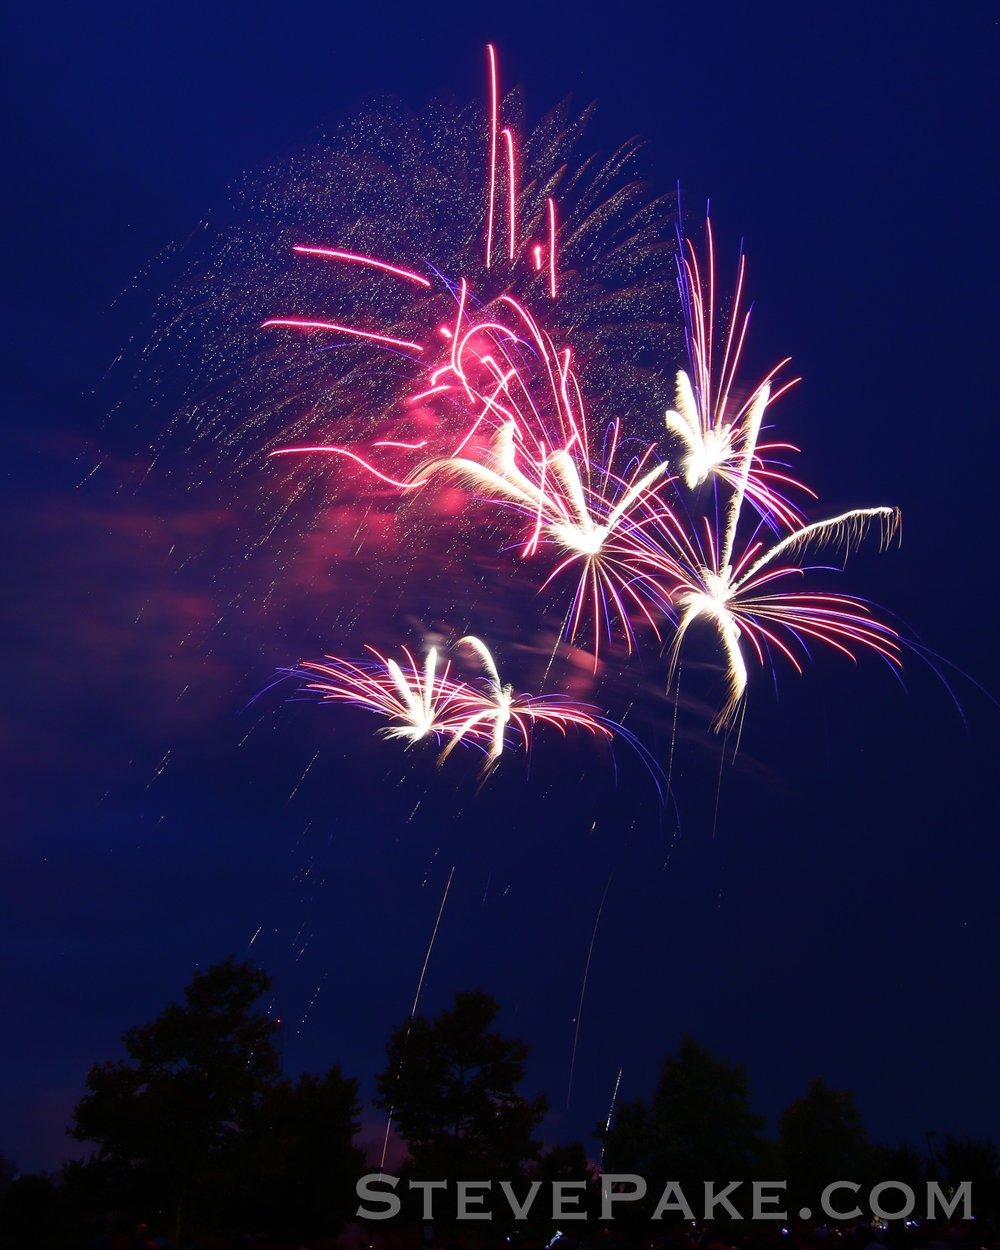 Fireworks2018_14_GE3A8518ap-HD-WM.jpg